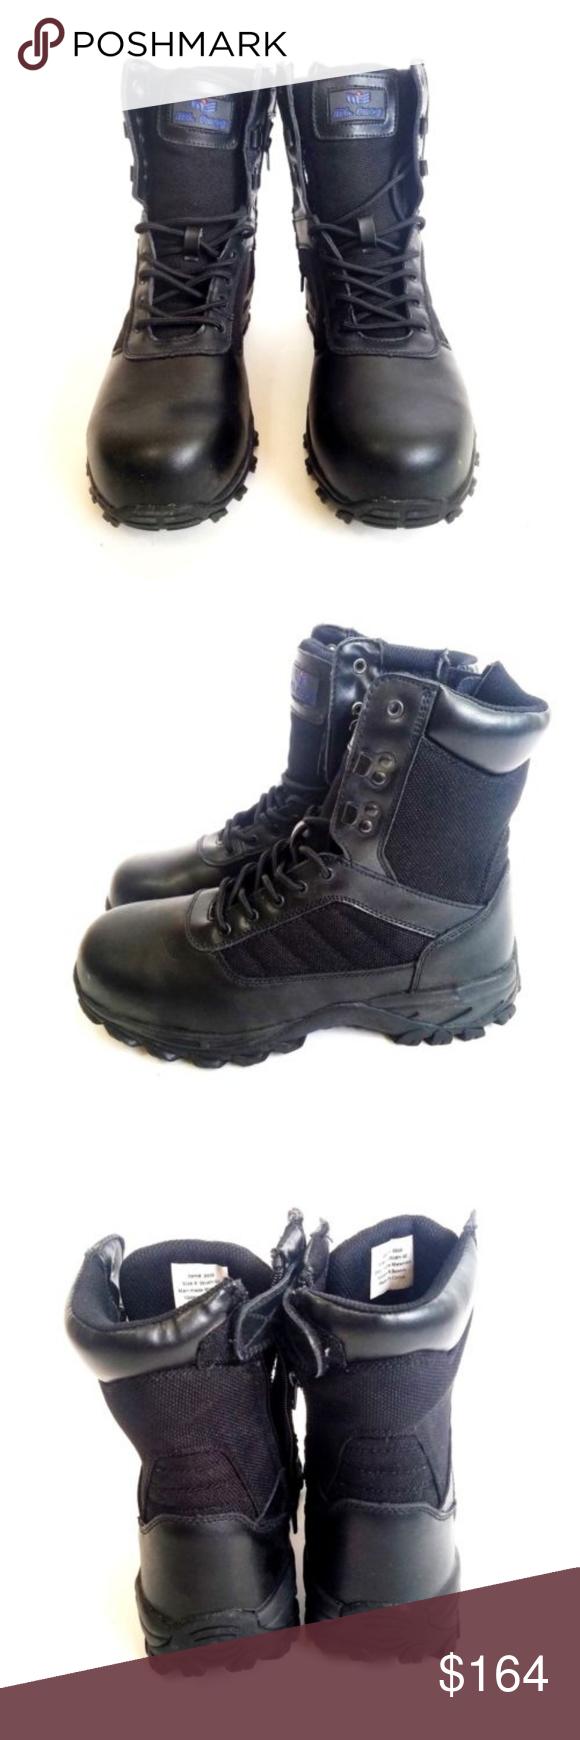 c944932ad1c Mt. Emey Men's 6506 Composite Toe Work Boot Size 9 Mt. Emey Men's ...